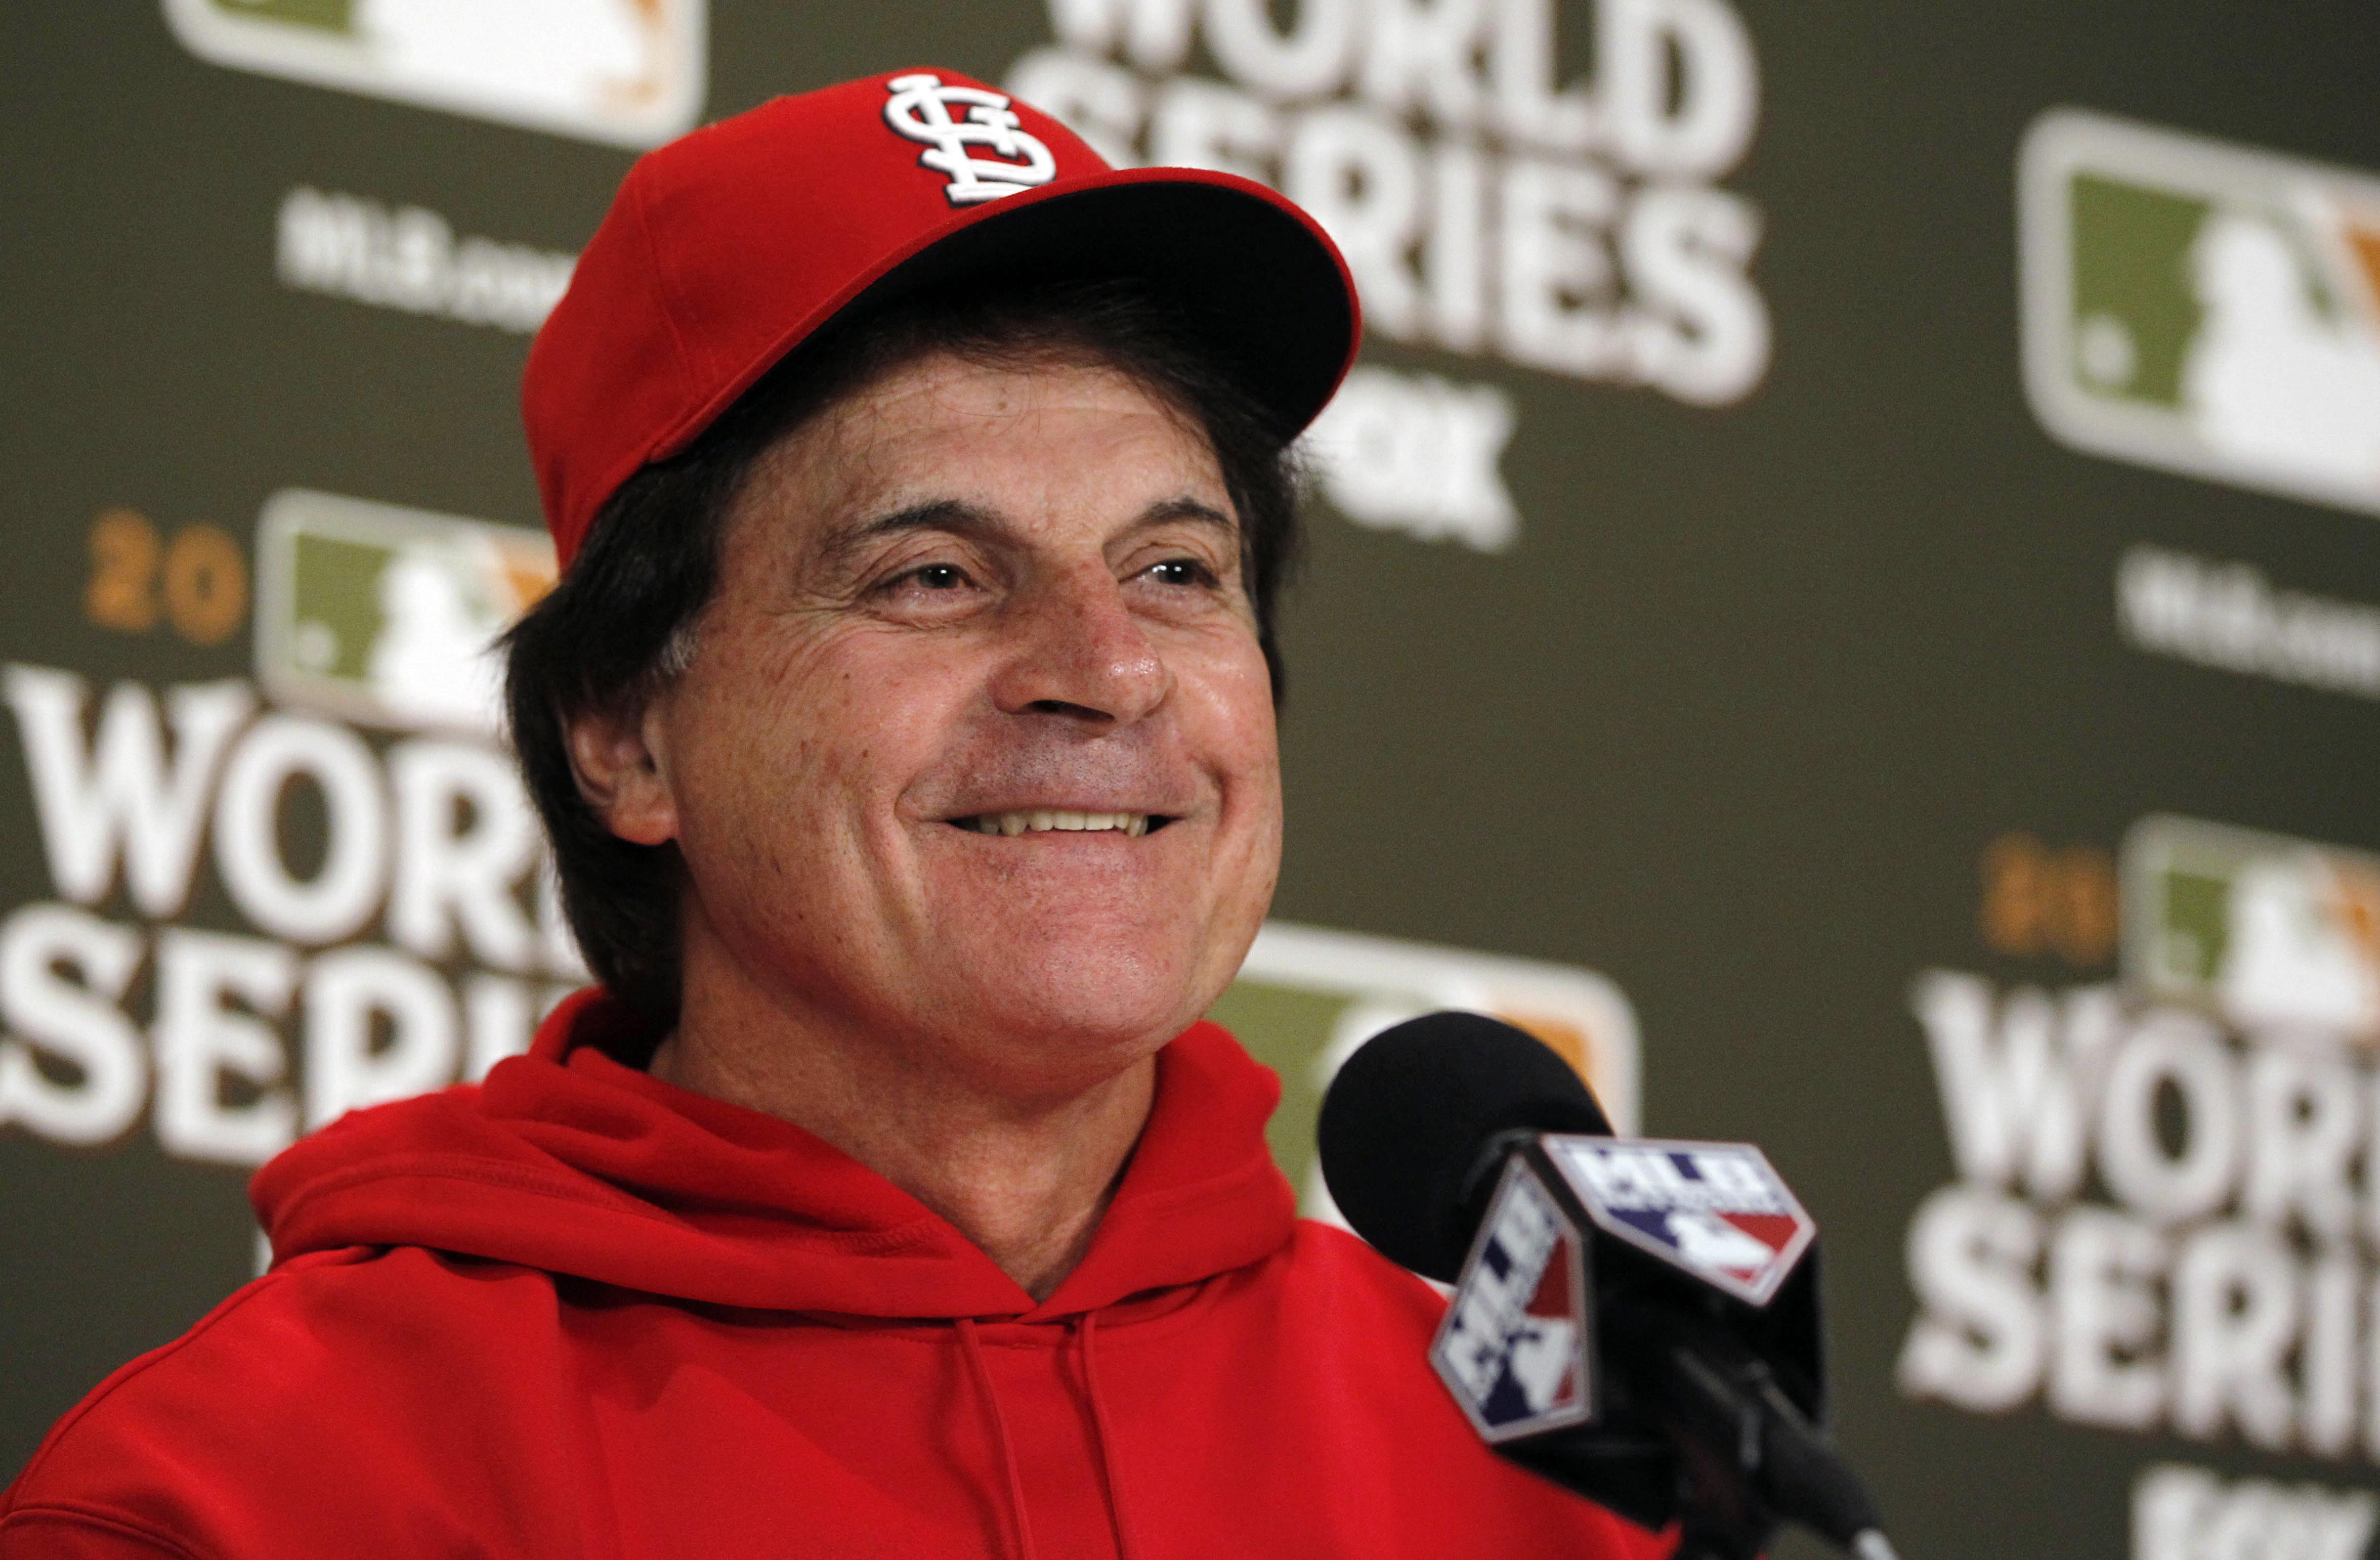 cardinals manager tony la russa announces retirement